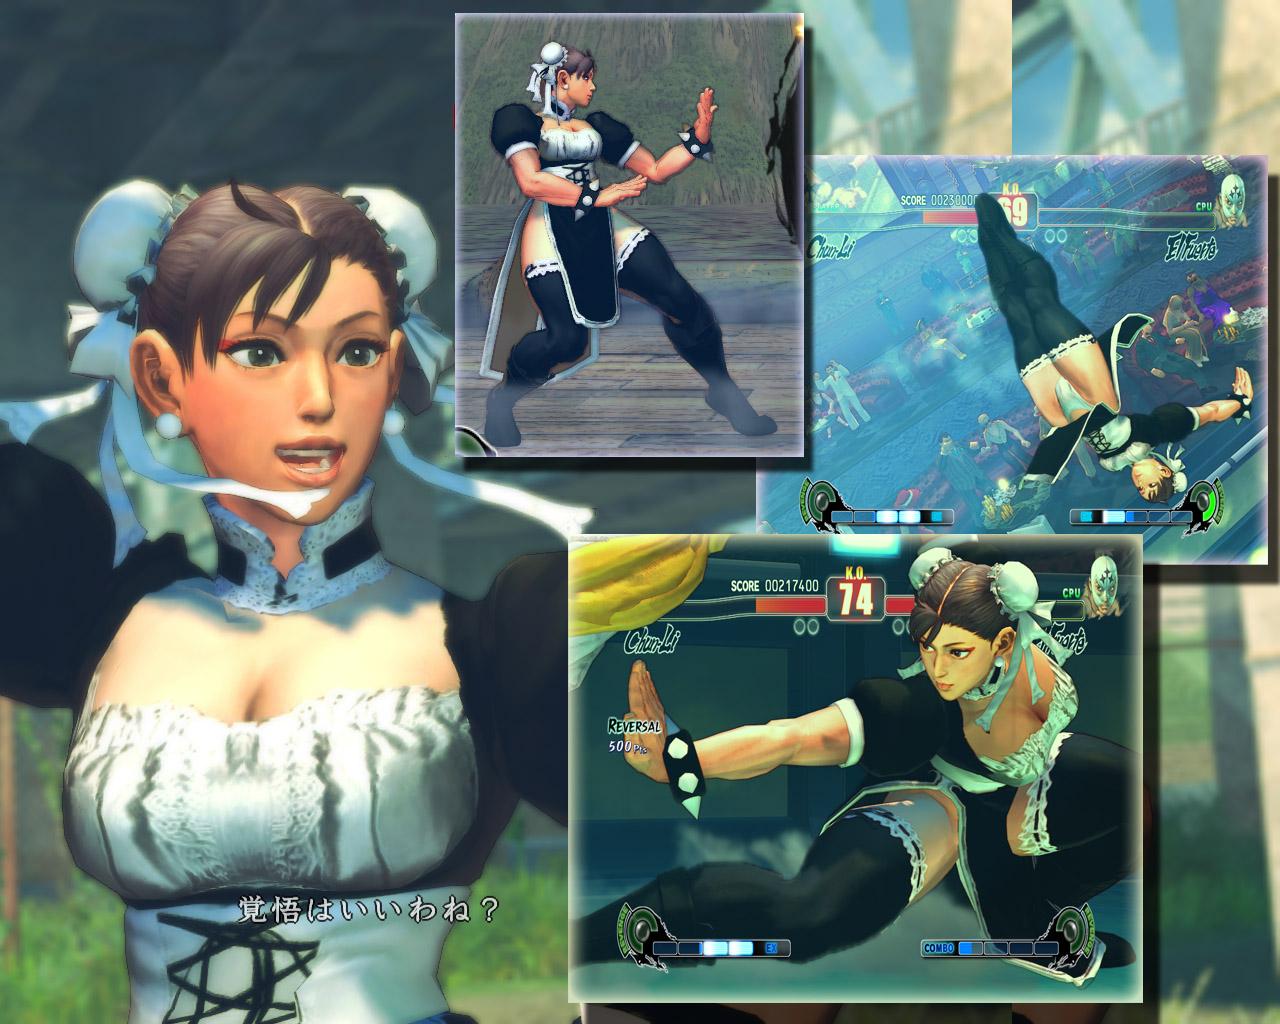 Street fighter iv arcade mods nude mods sexy gallery